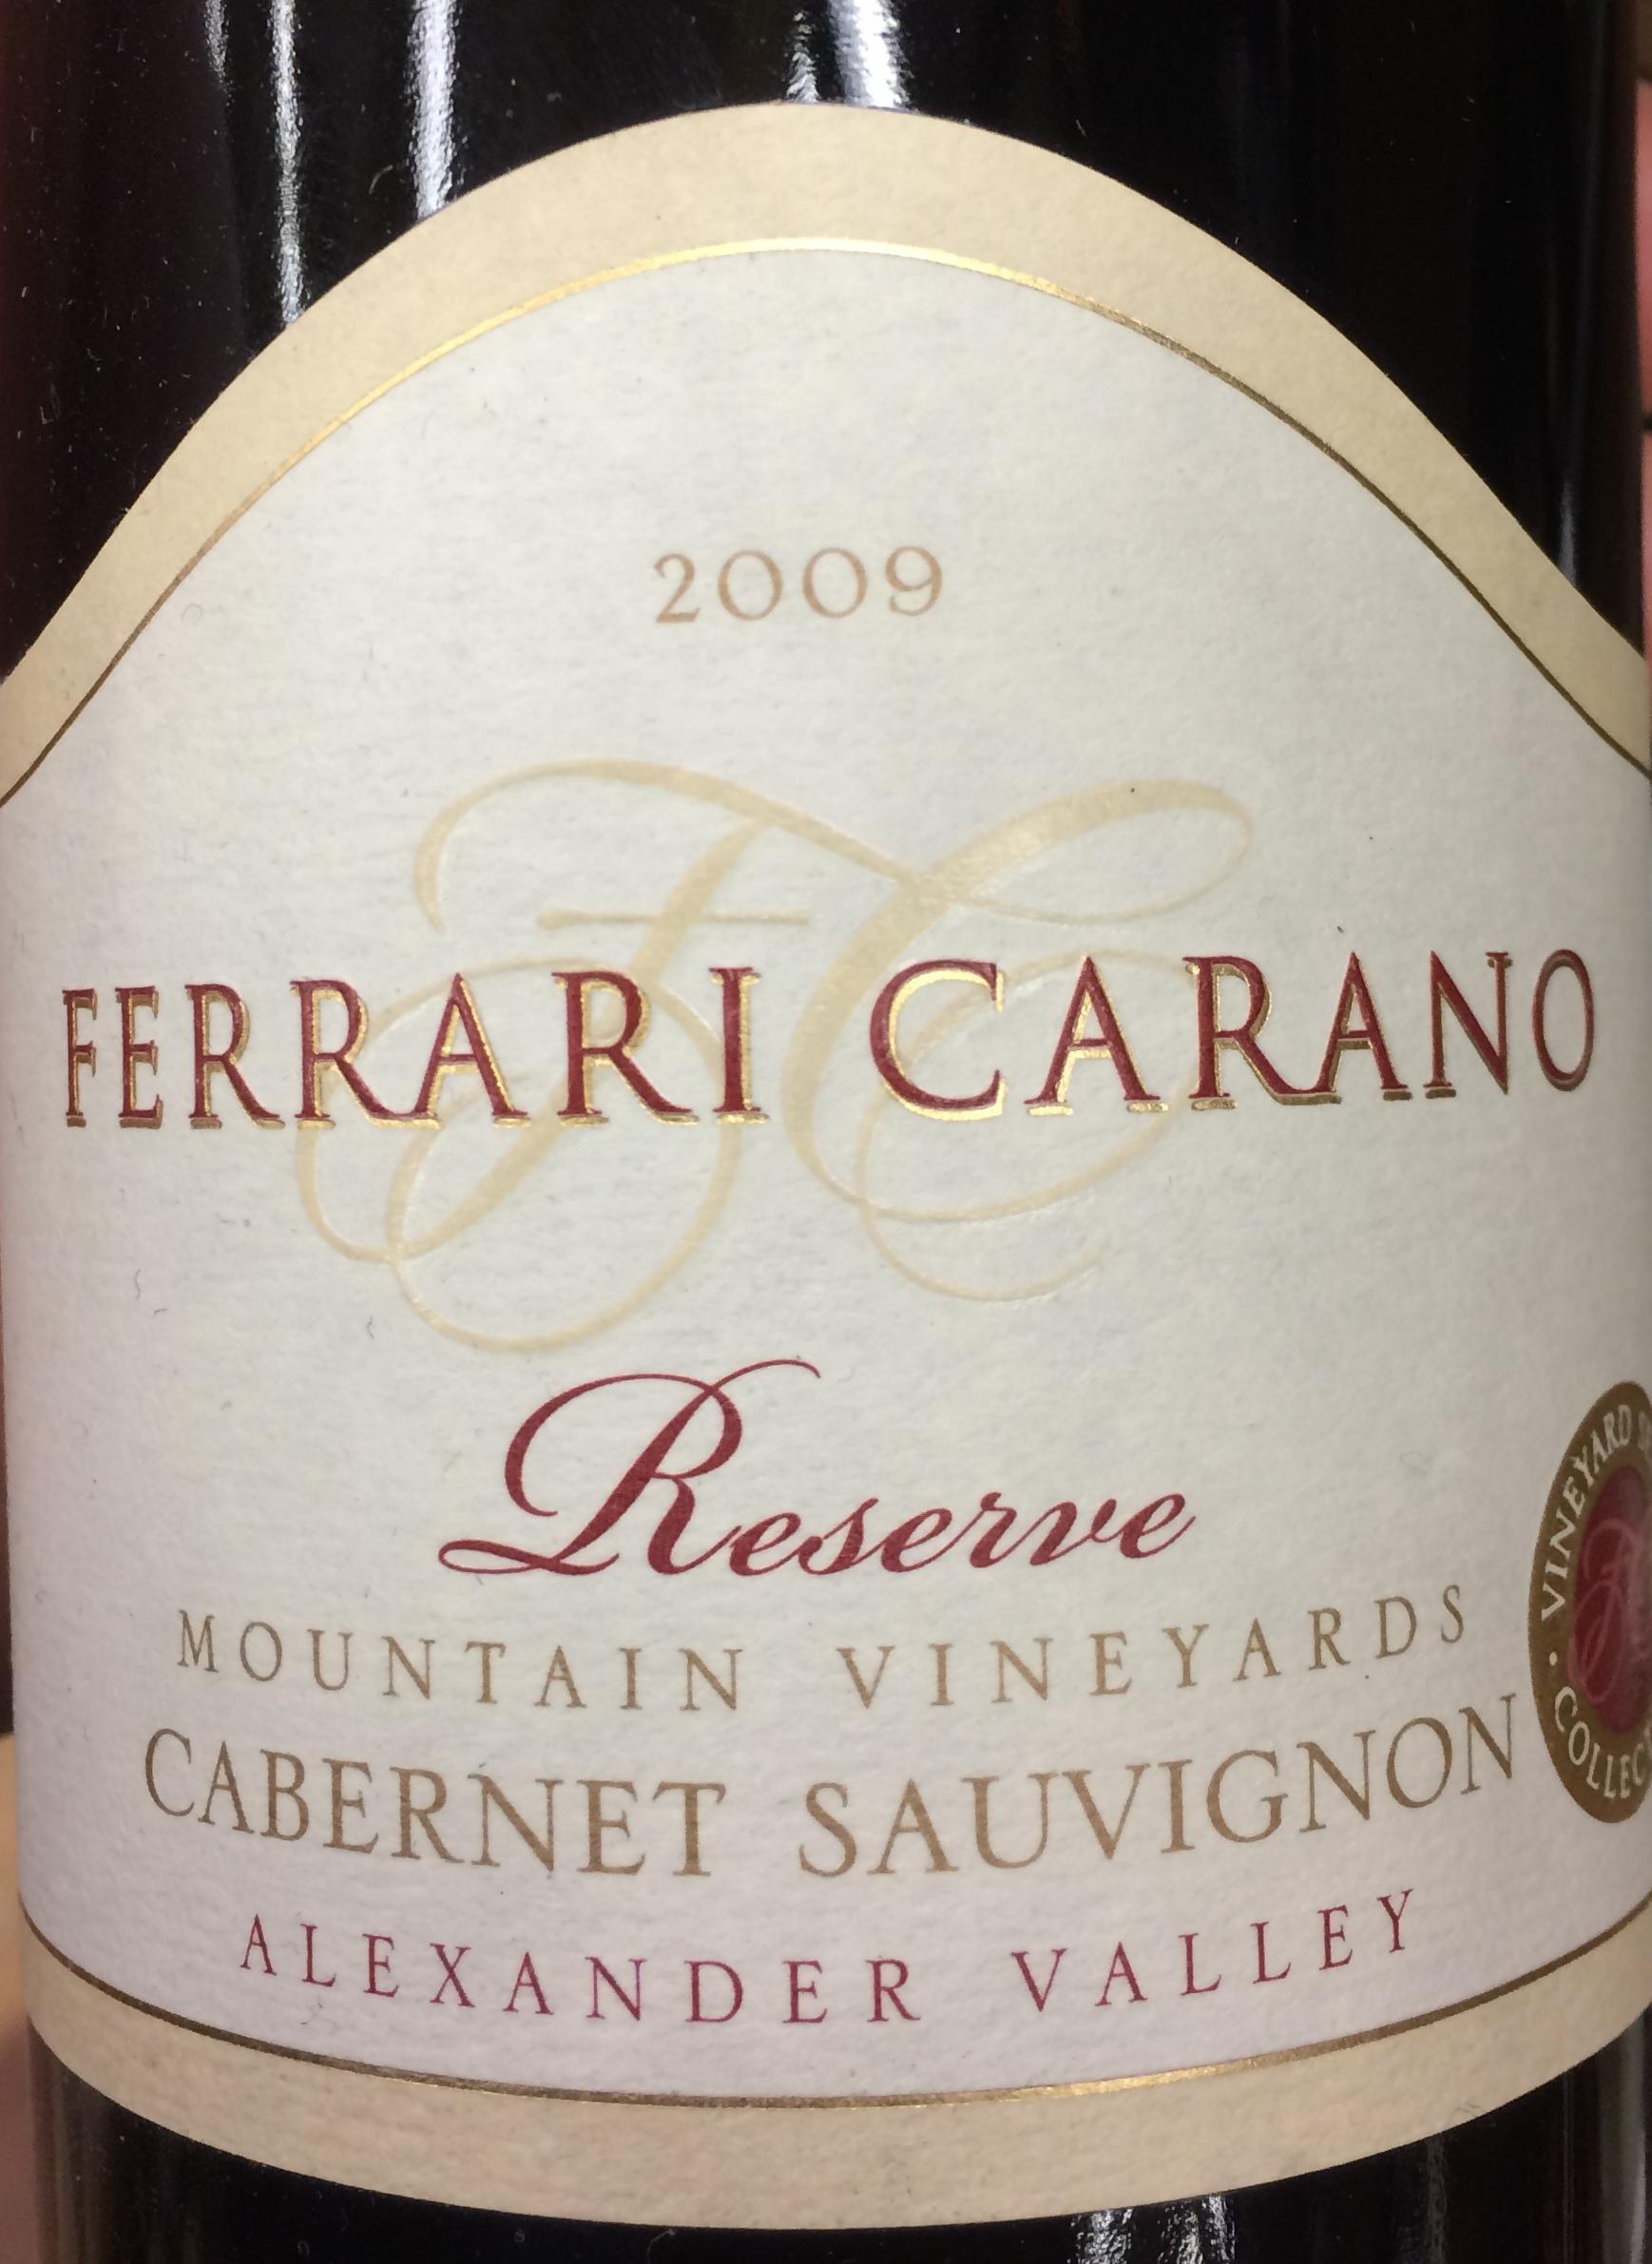 Ferrari Carano 2009 Reserve Cab. Ferrari Carano 2009 Mountain Vineyards  Reserve Cabernet Sauvignon